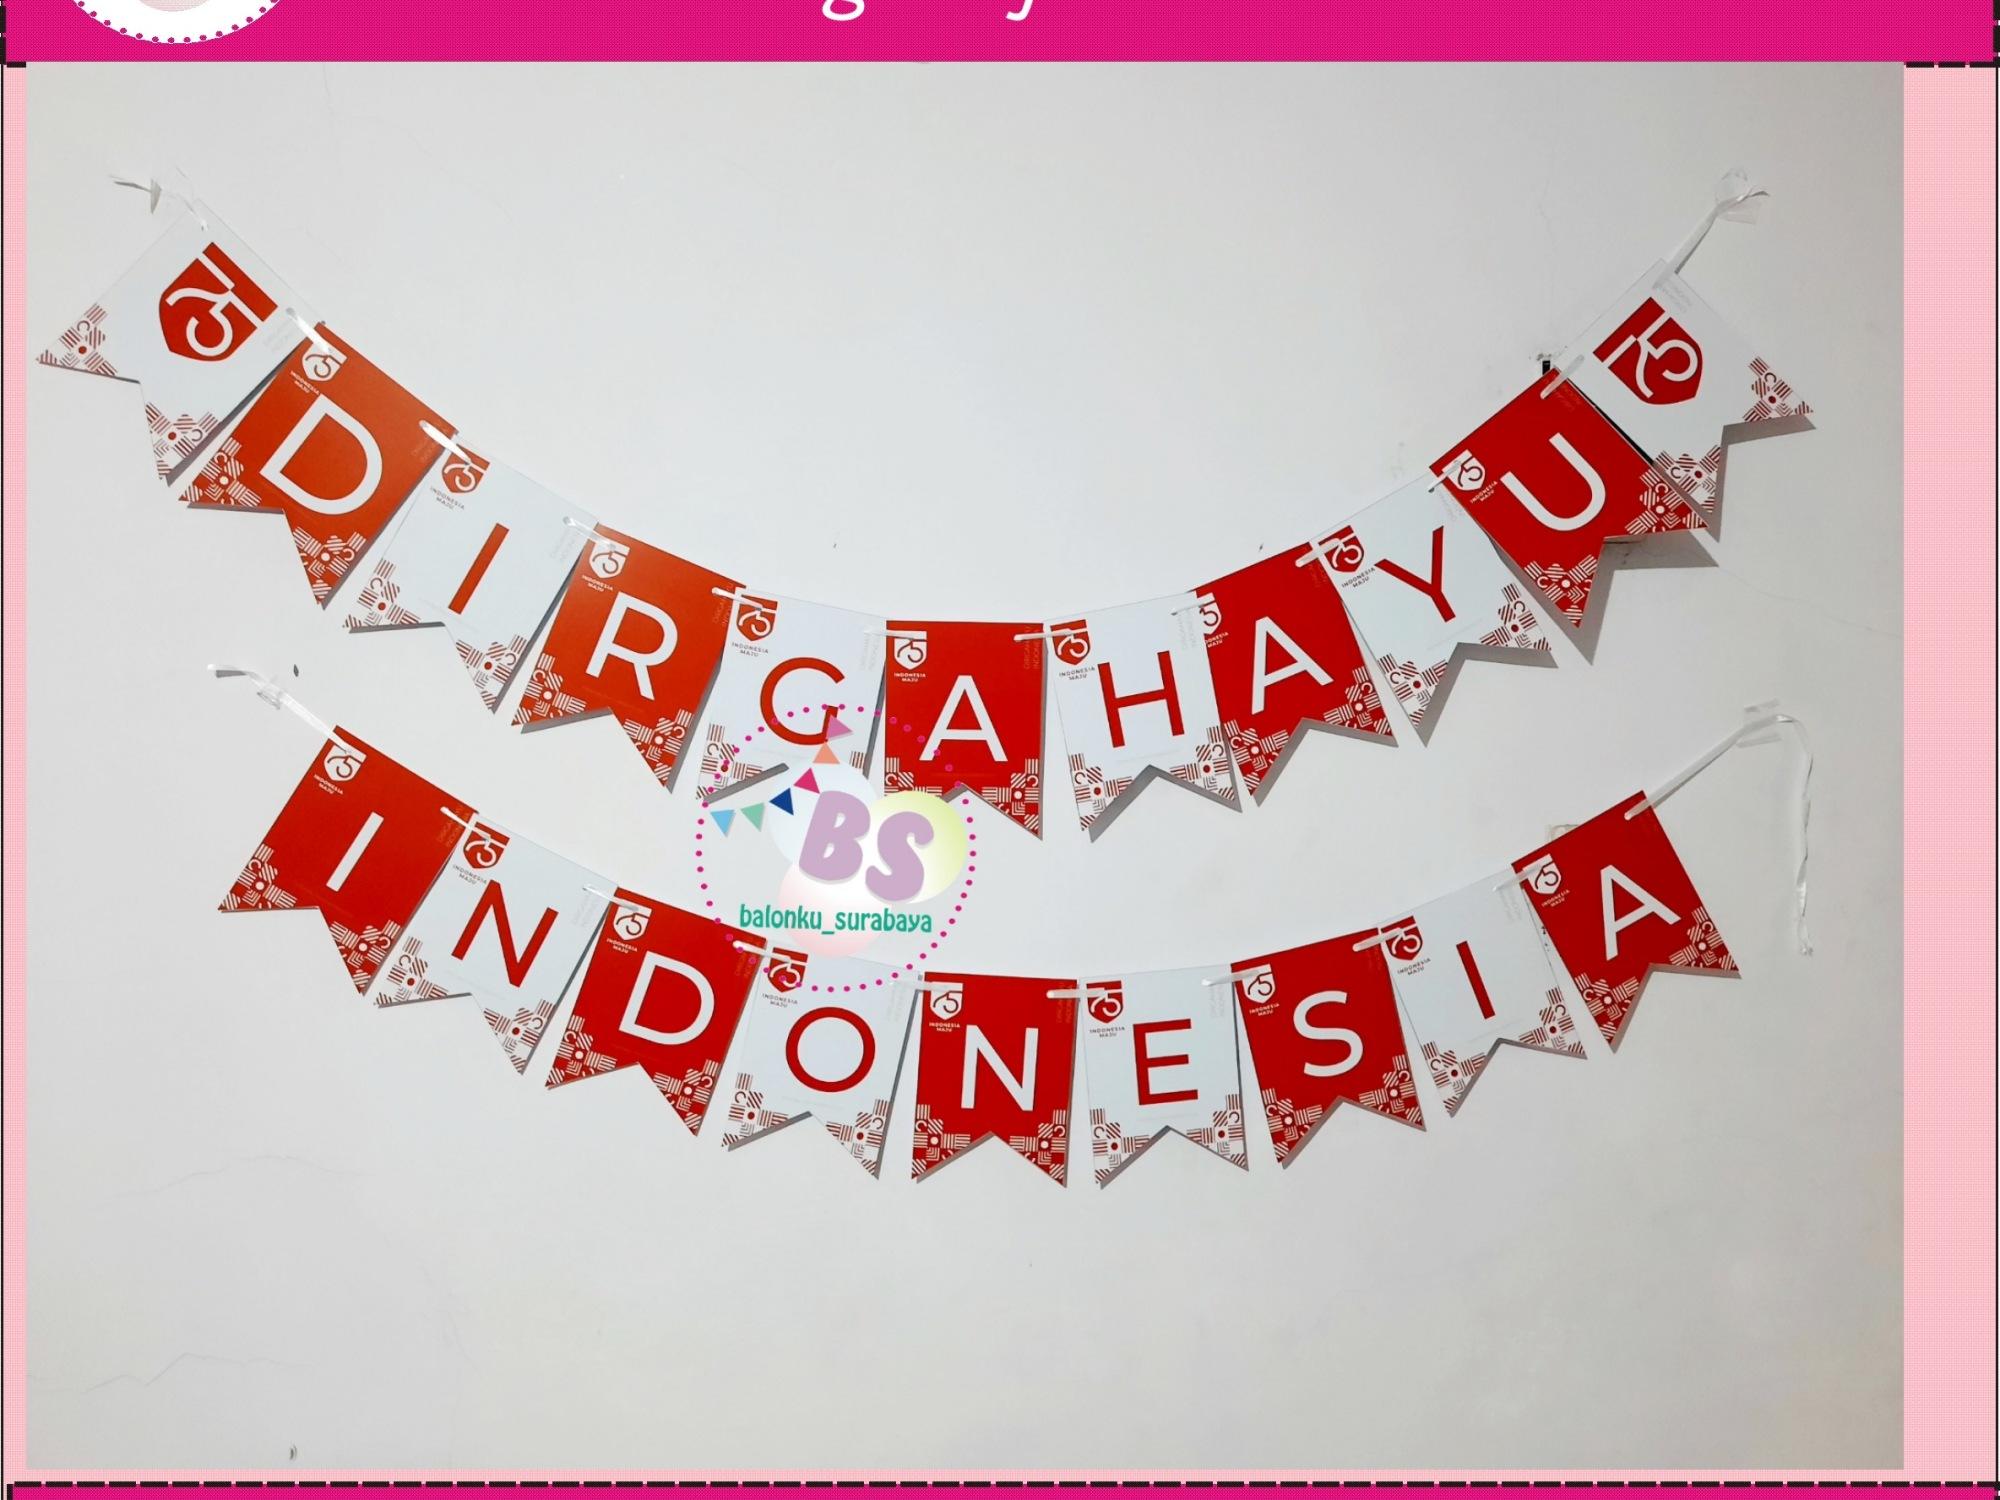 tulisan dinding dirgahayu indonesia, garland balon, parcel balon ucapan, parcel balon ucapan, parcel balon ucapan warna pink, balon bentuk bunga, standing balon custom, balon ucapan ulang tahun anak, balon ucapan ulang tahun warna merah, balon ucapan ulang tahun merah, balon ucapan ulang tahun anak balon ucapan warna peach, baln ucapan box coklat, jual balon latex twist hijau emerald, BAlon Gas,Bunga dekorasi,Rangkaian bunga artificial, Buket bunga, buket bunga mawar, harga buket bunga,Balon sablon, balon Printing, balon promosi, Perlengkapan ulang tahun, Balon latex , balon doff, balon natal, balon agustusan, balon dekorasi, balonku Surabaya, 085733133529